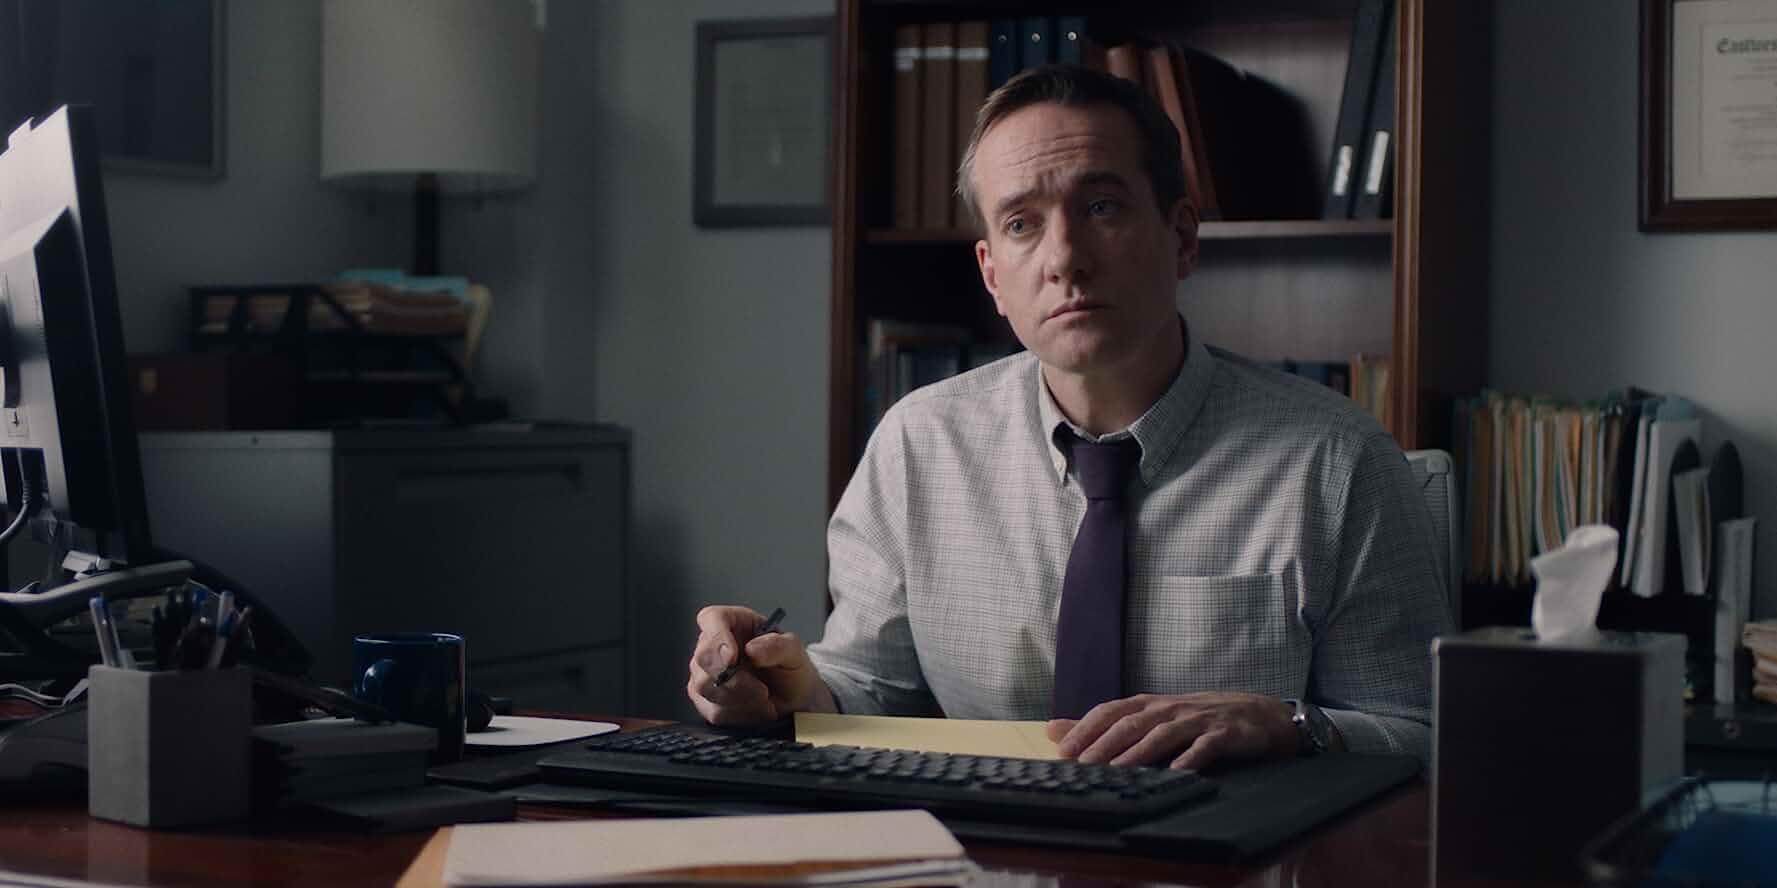 Matthew Macfadyen in The Assistant (2019)